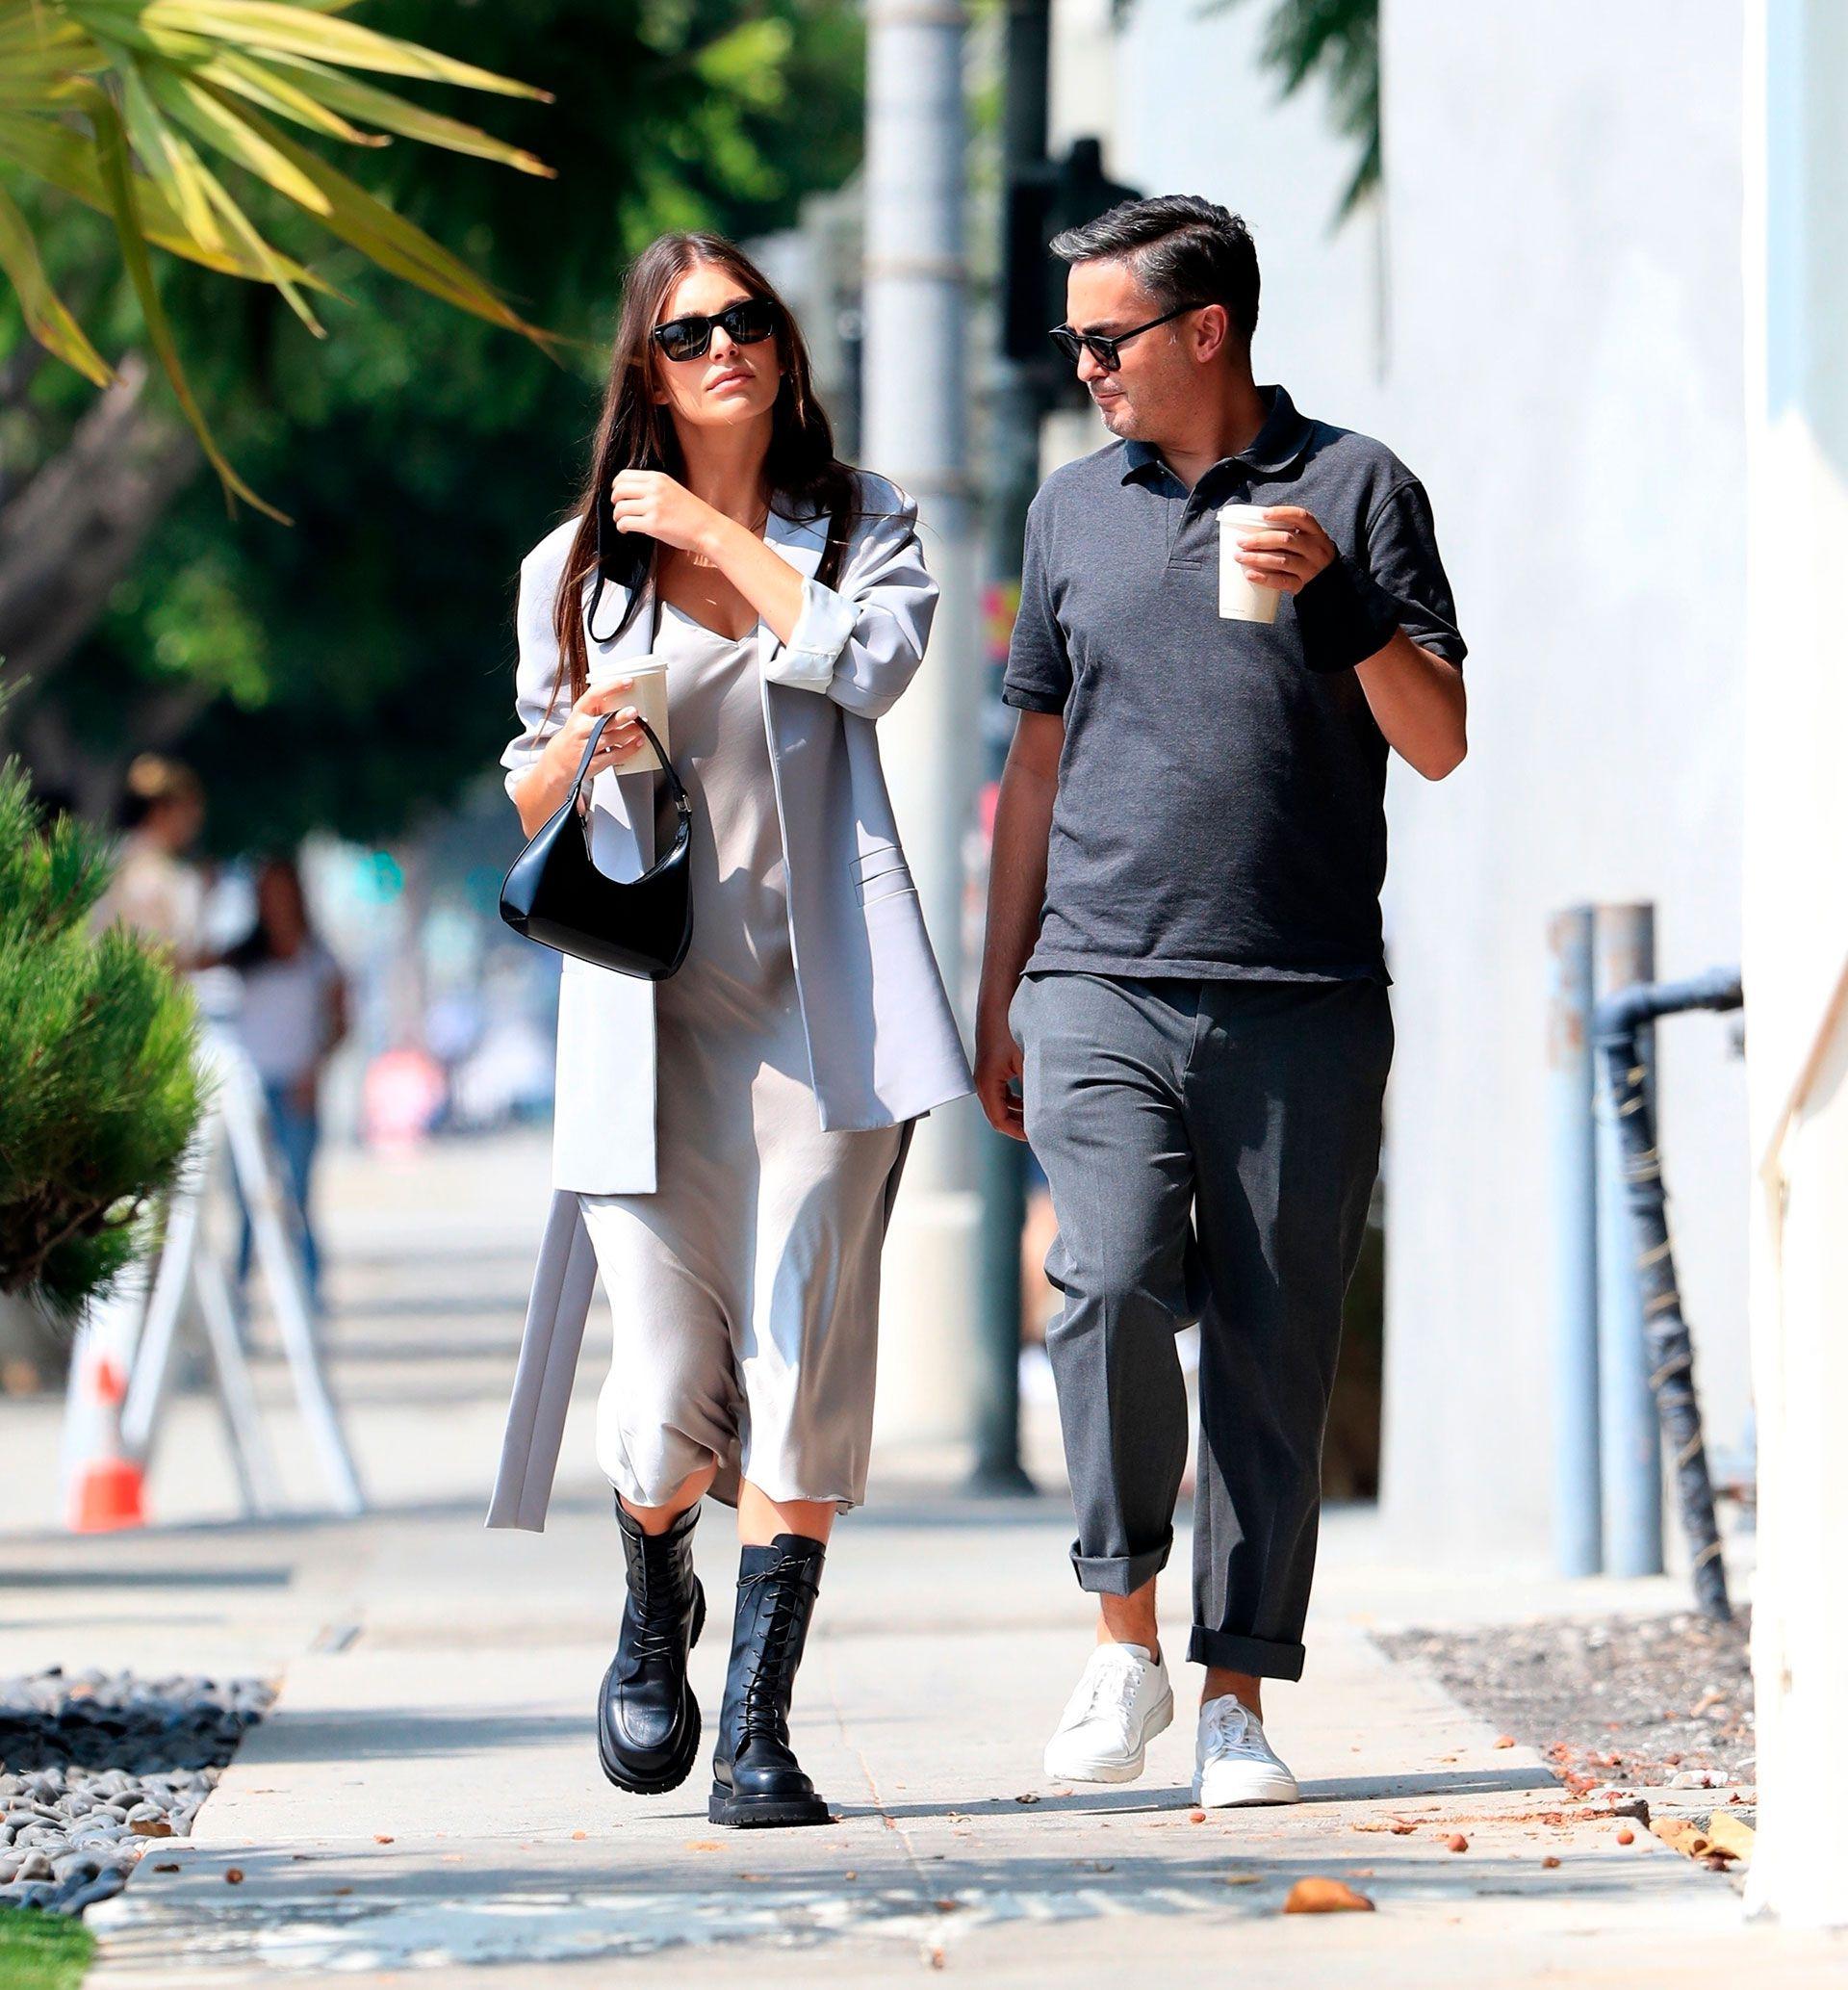 Celebrities-en-un-clic-Camila-Morrone-18092020